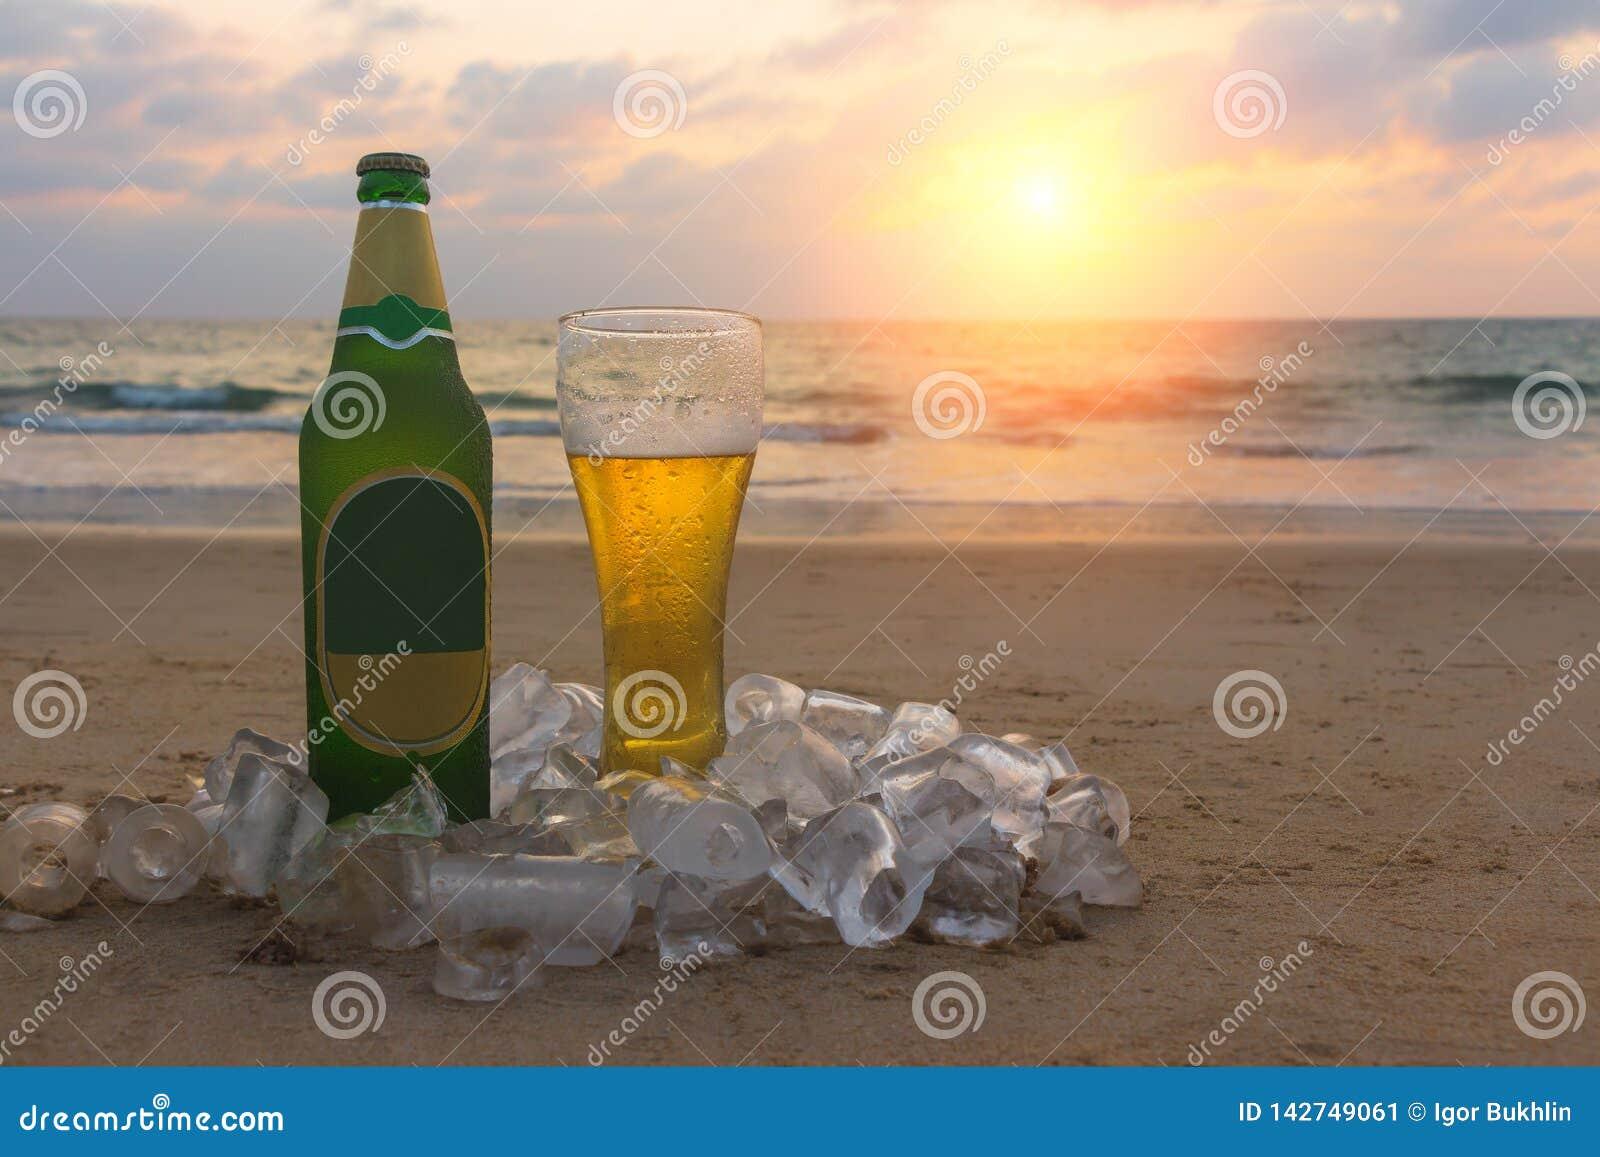 Misted flaska och exponeringsglas av kallt ?l p? sanden av sceniskt p? bakgrunden av seascape, solnedg?nghimmel och havsv?gor